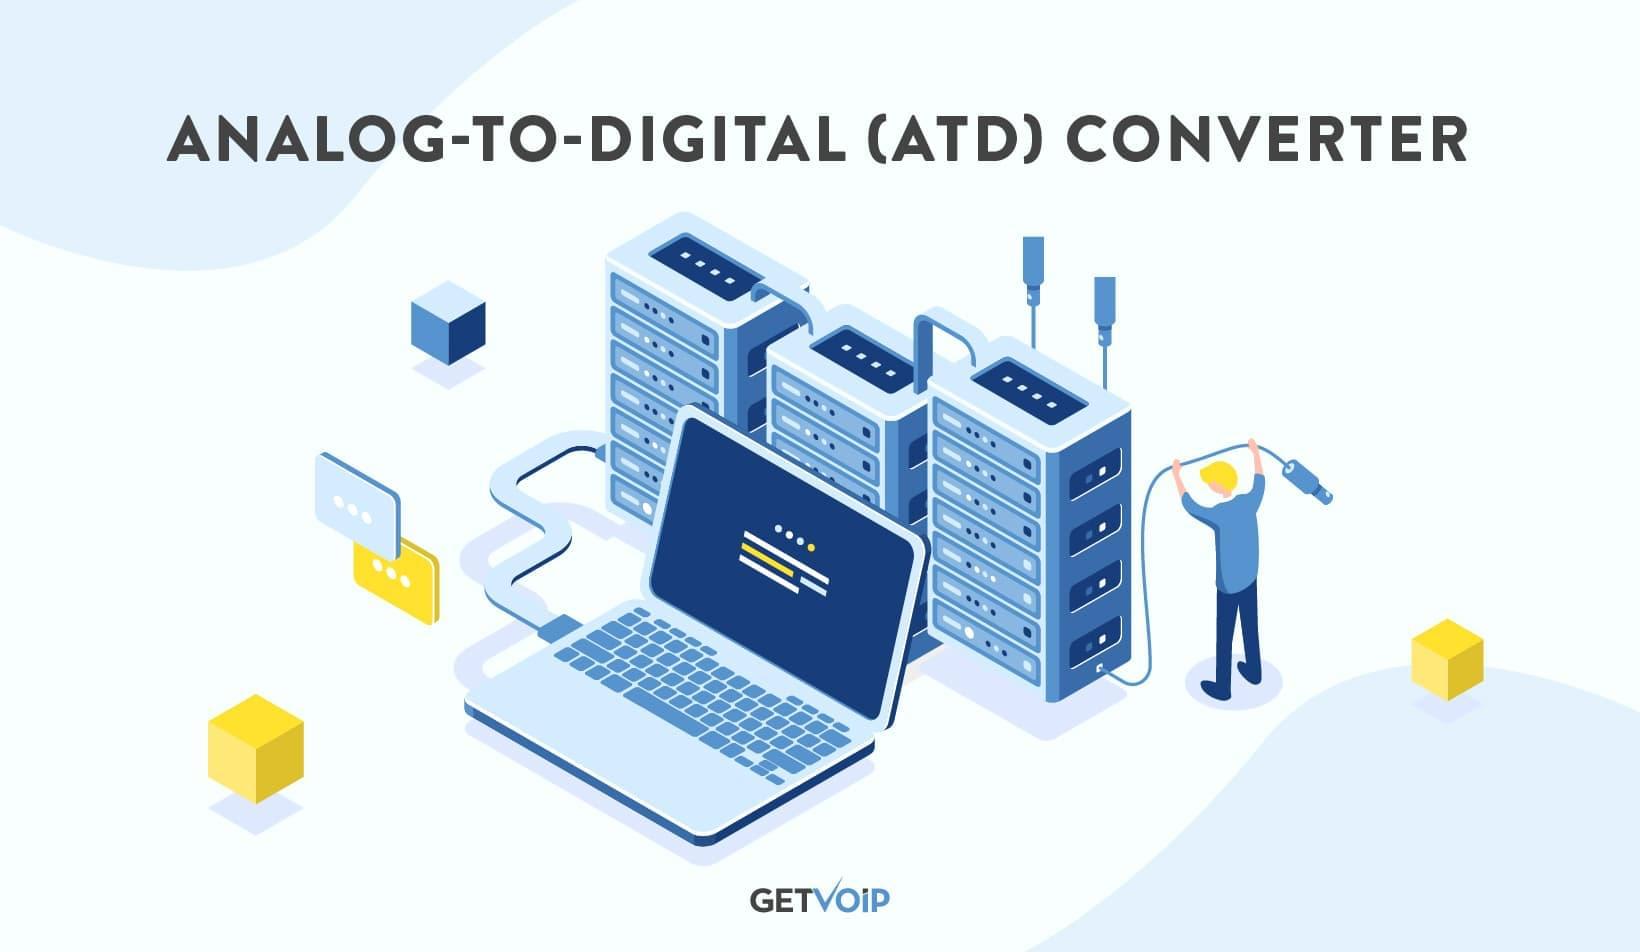 Analog-to-Digital (ATD) Converter